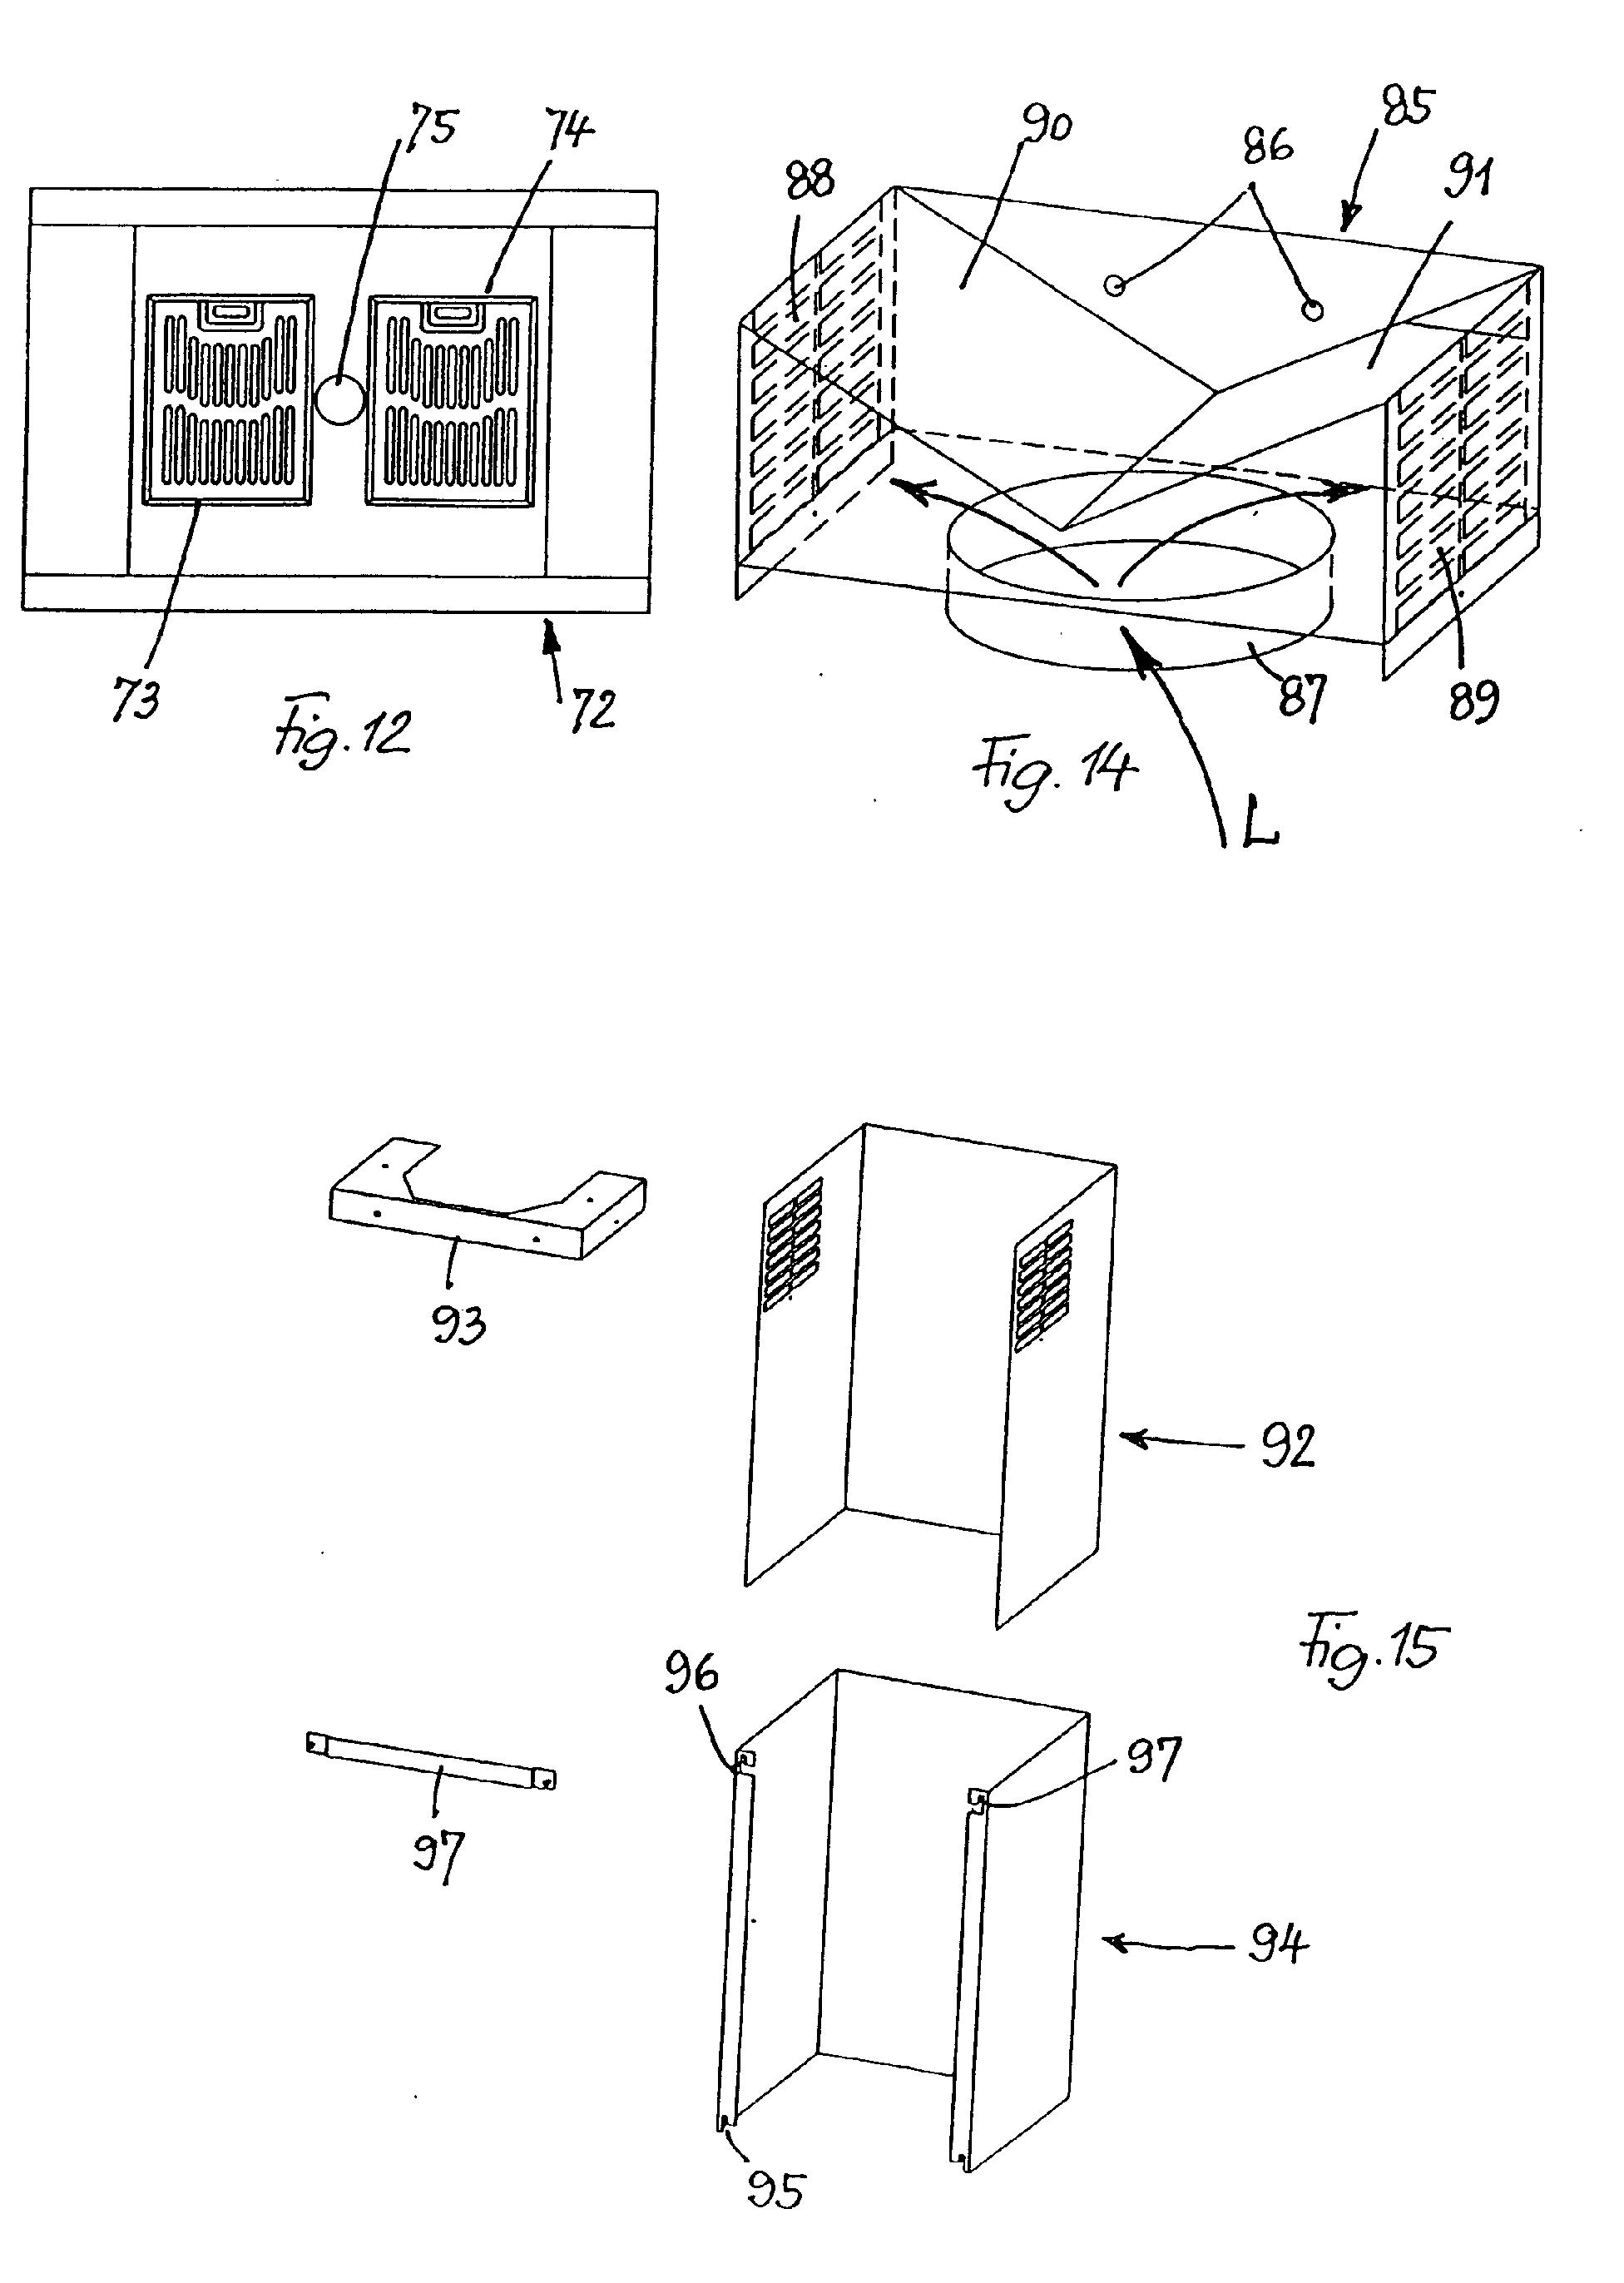 anschluss dunstabzugshaube abluftkanal anschluss dunstabzugshaube abluftkanal neu flachkanal f. Black Bedroom Furniture Sets. Home Design Ideas